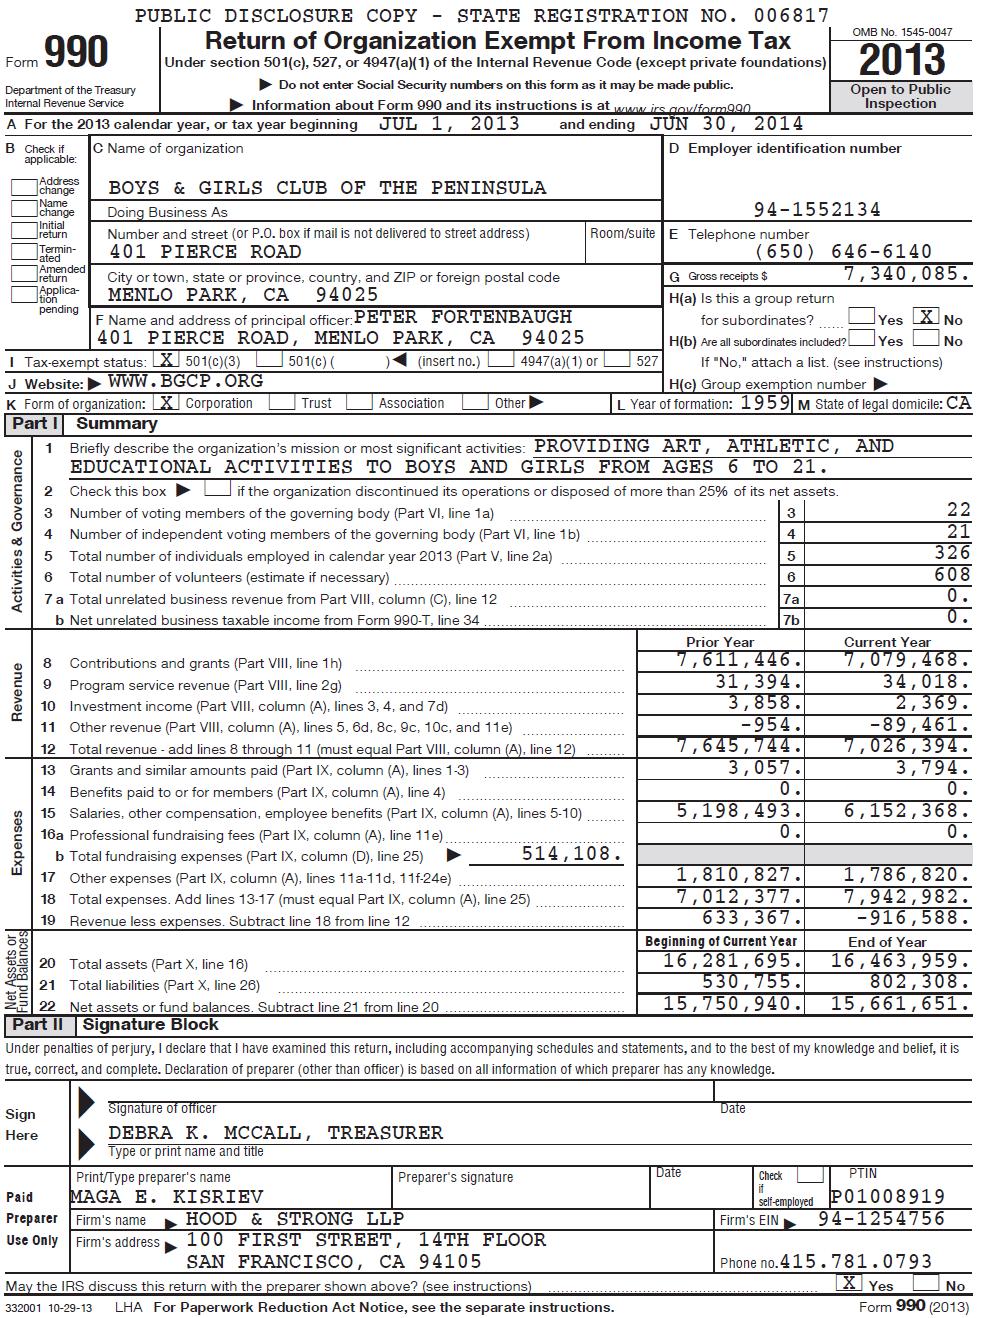 IRS Form 990 - 2014